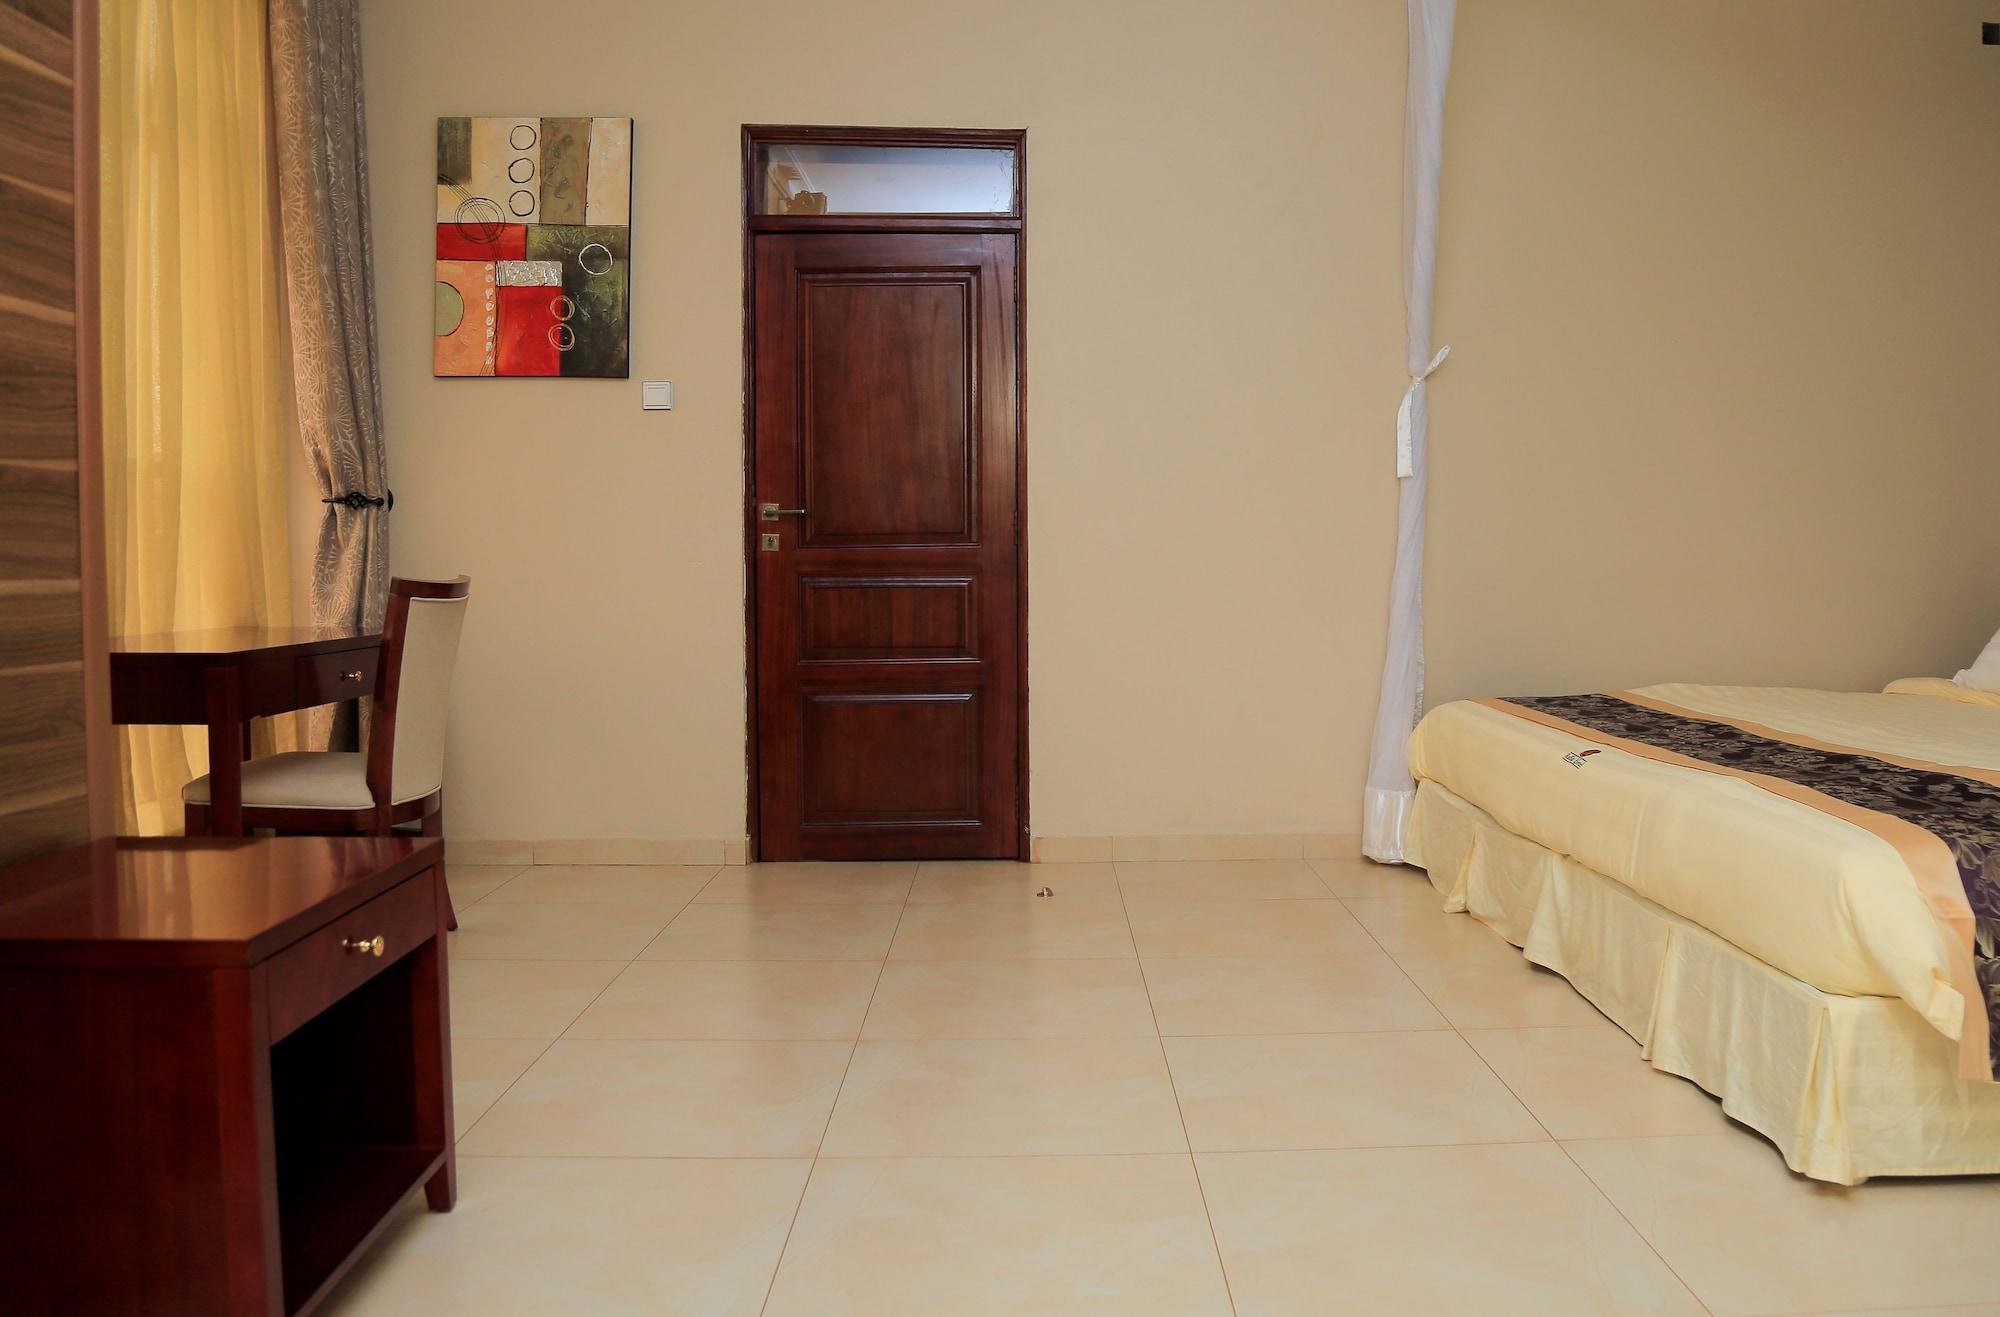 Rafiki Hotel Hoima, Bugahya